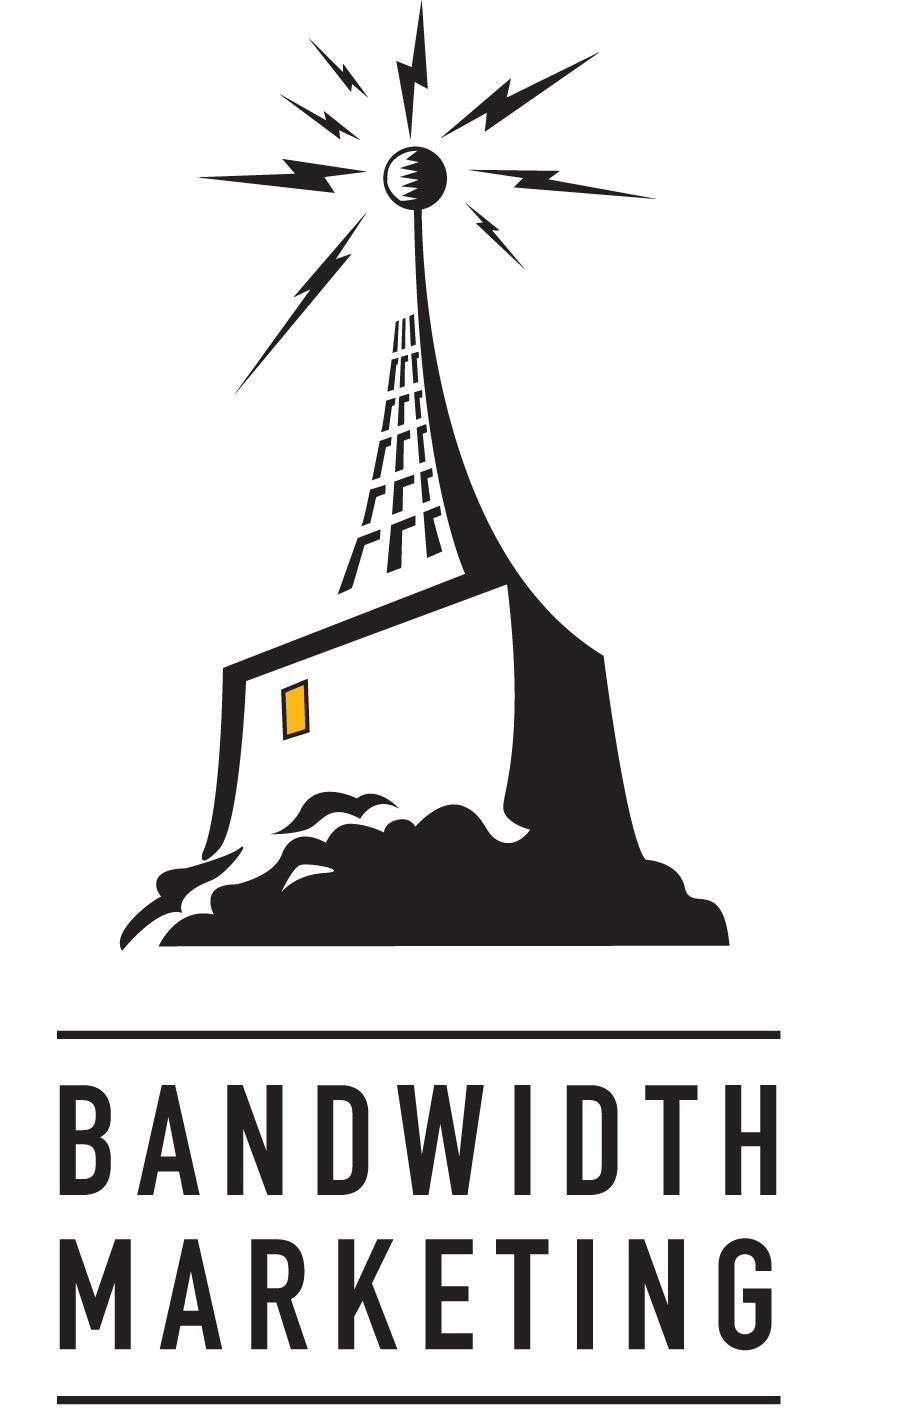 Bandwidth Marketing Group